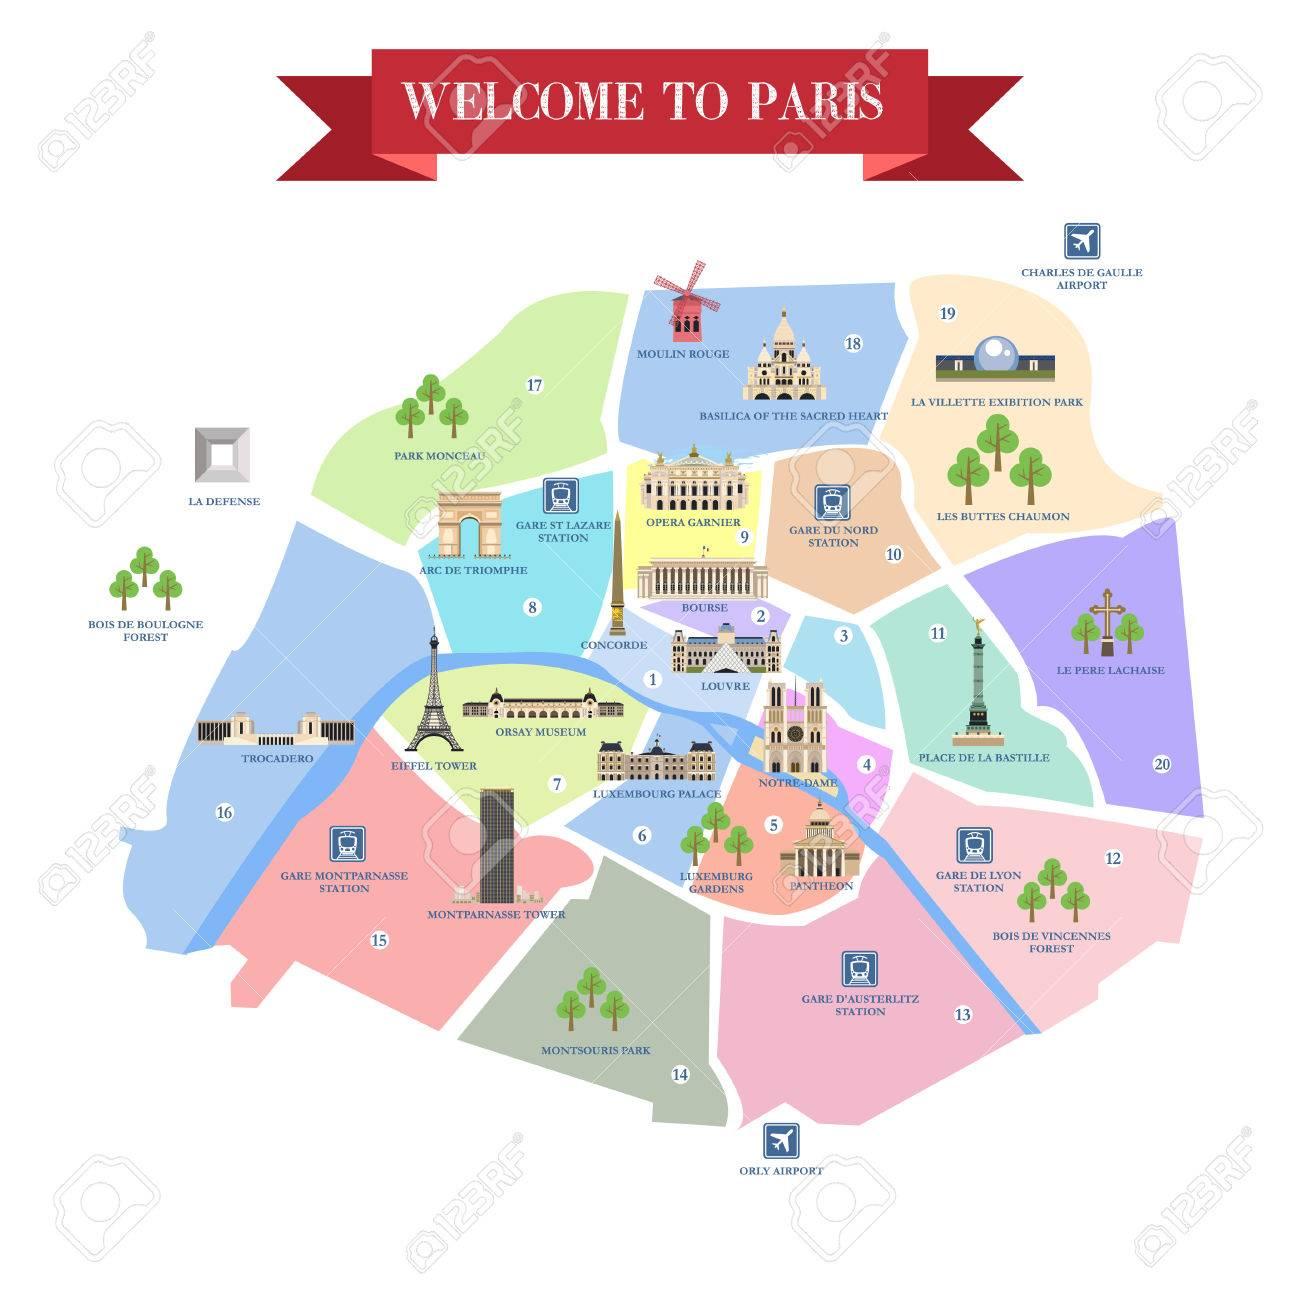 mapa de paris com monumentos Mapa Detallado De París. Famosos Monumentos, Catedrales, Museos  mapa de paris com monumentos